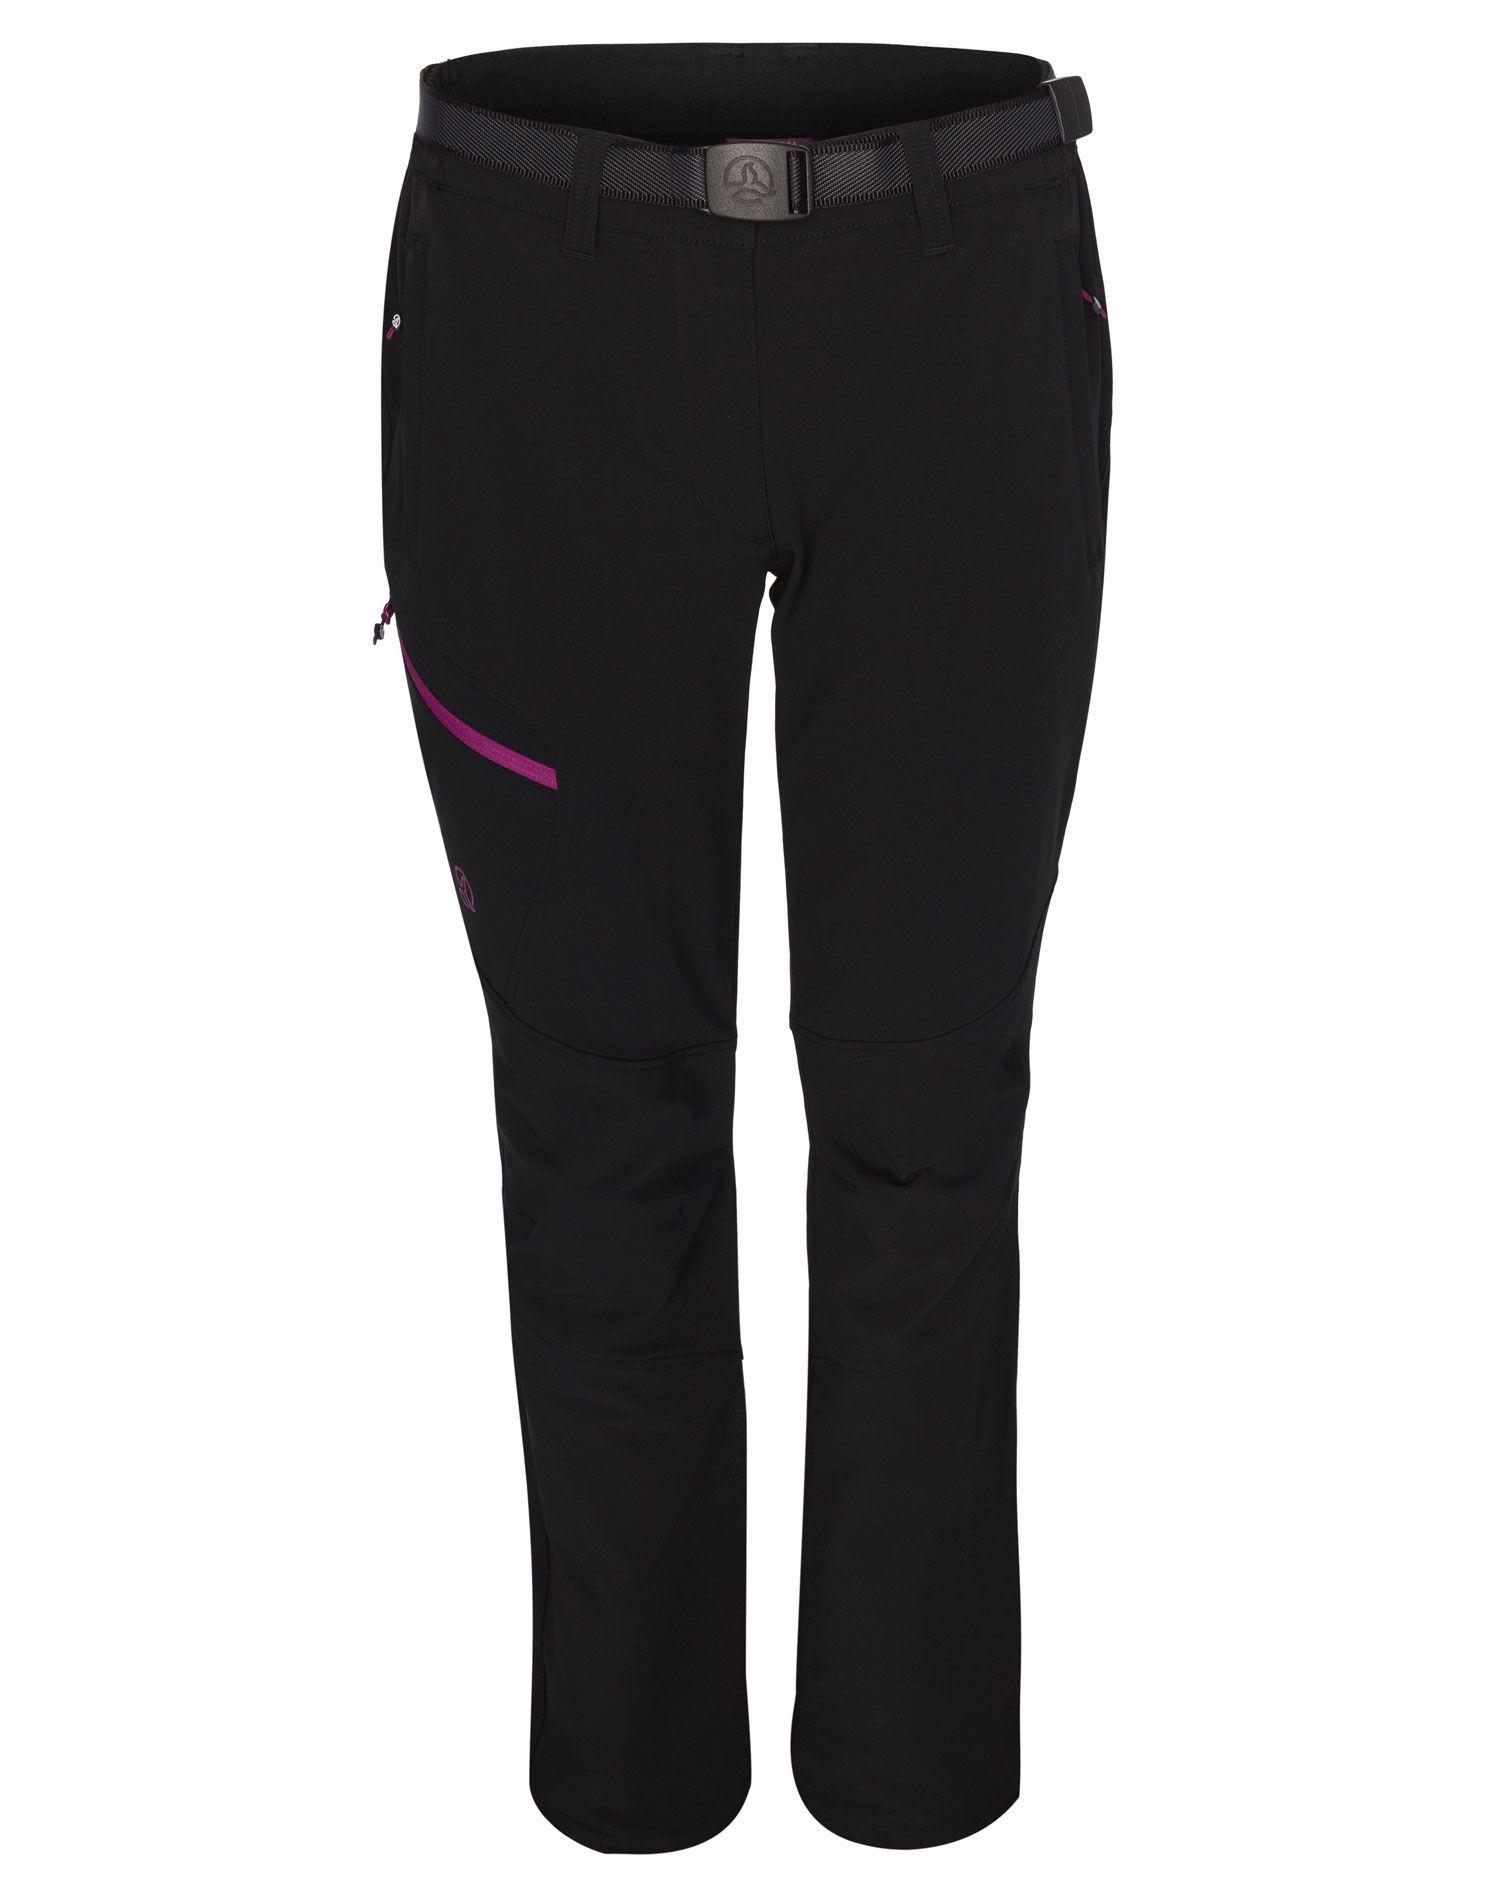 Ternua Hopeall Pant - Pantalon randonnée femme